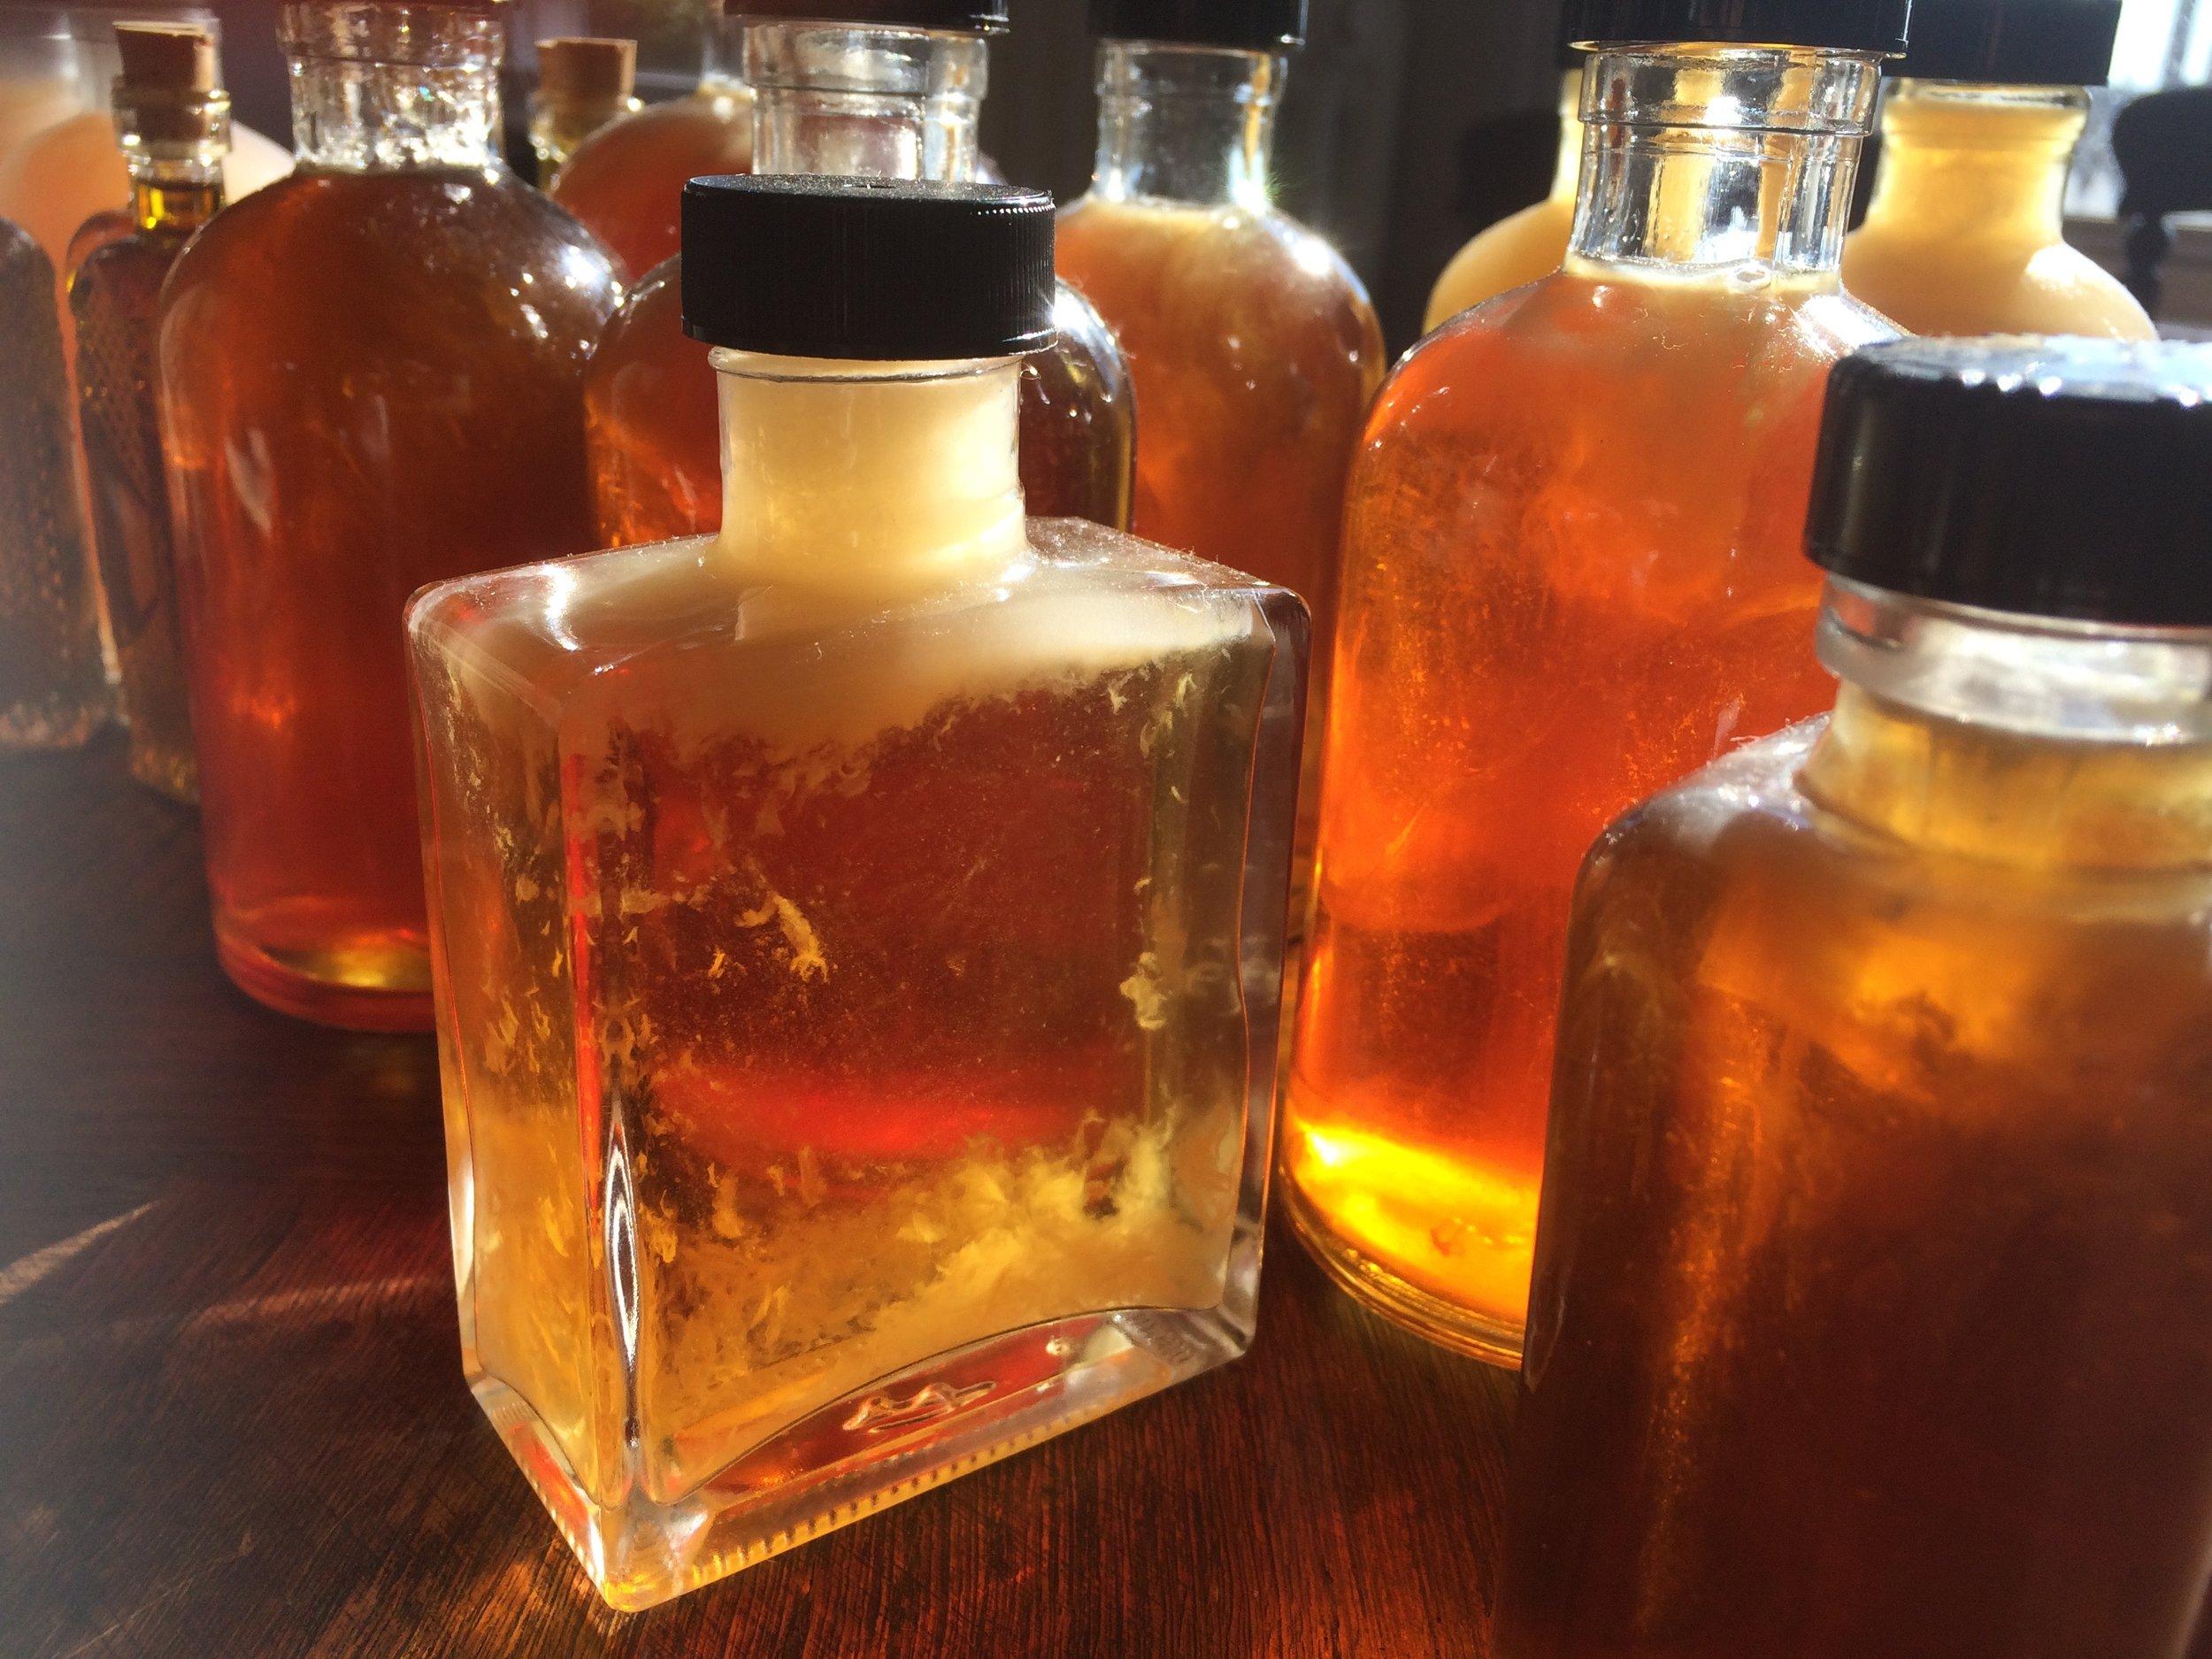 Raw Wild Honey Shampoos, Wild Neem Honey, Wild Canadian Honey, Wild African Honey limited series Spring 2016